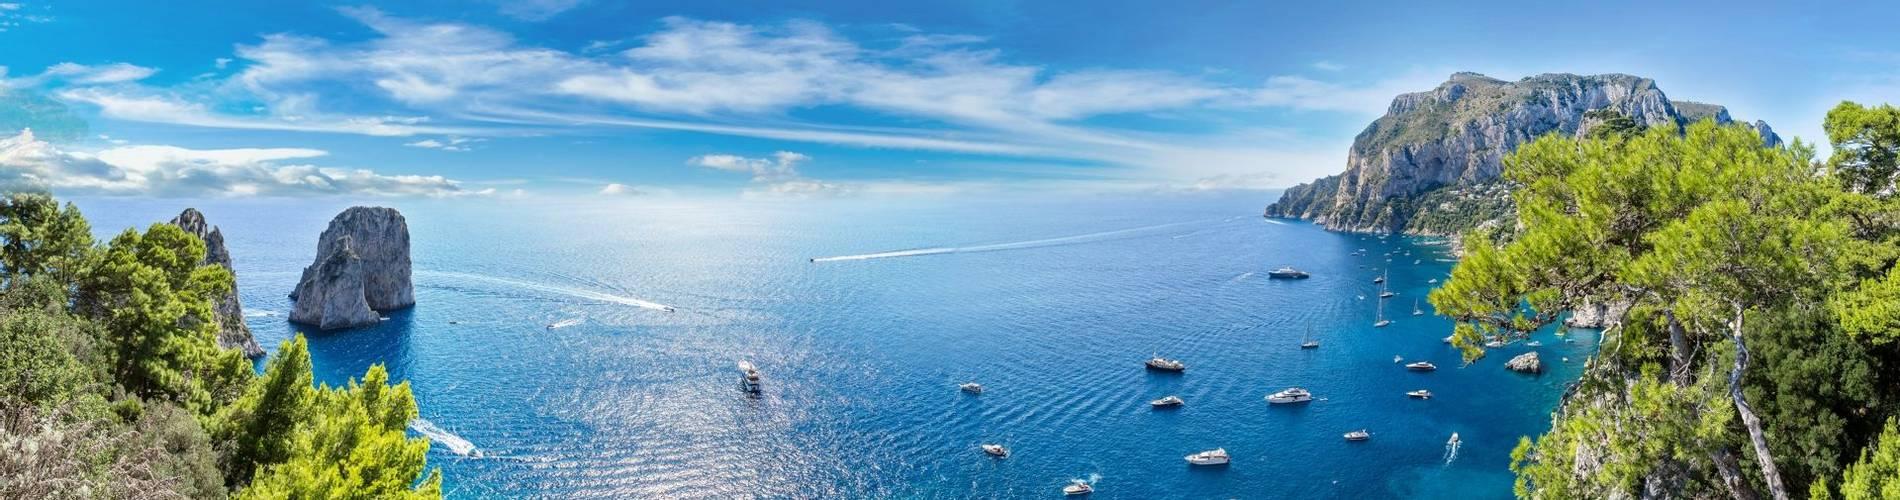 Capri Island, Italy.jpg